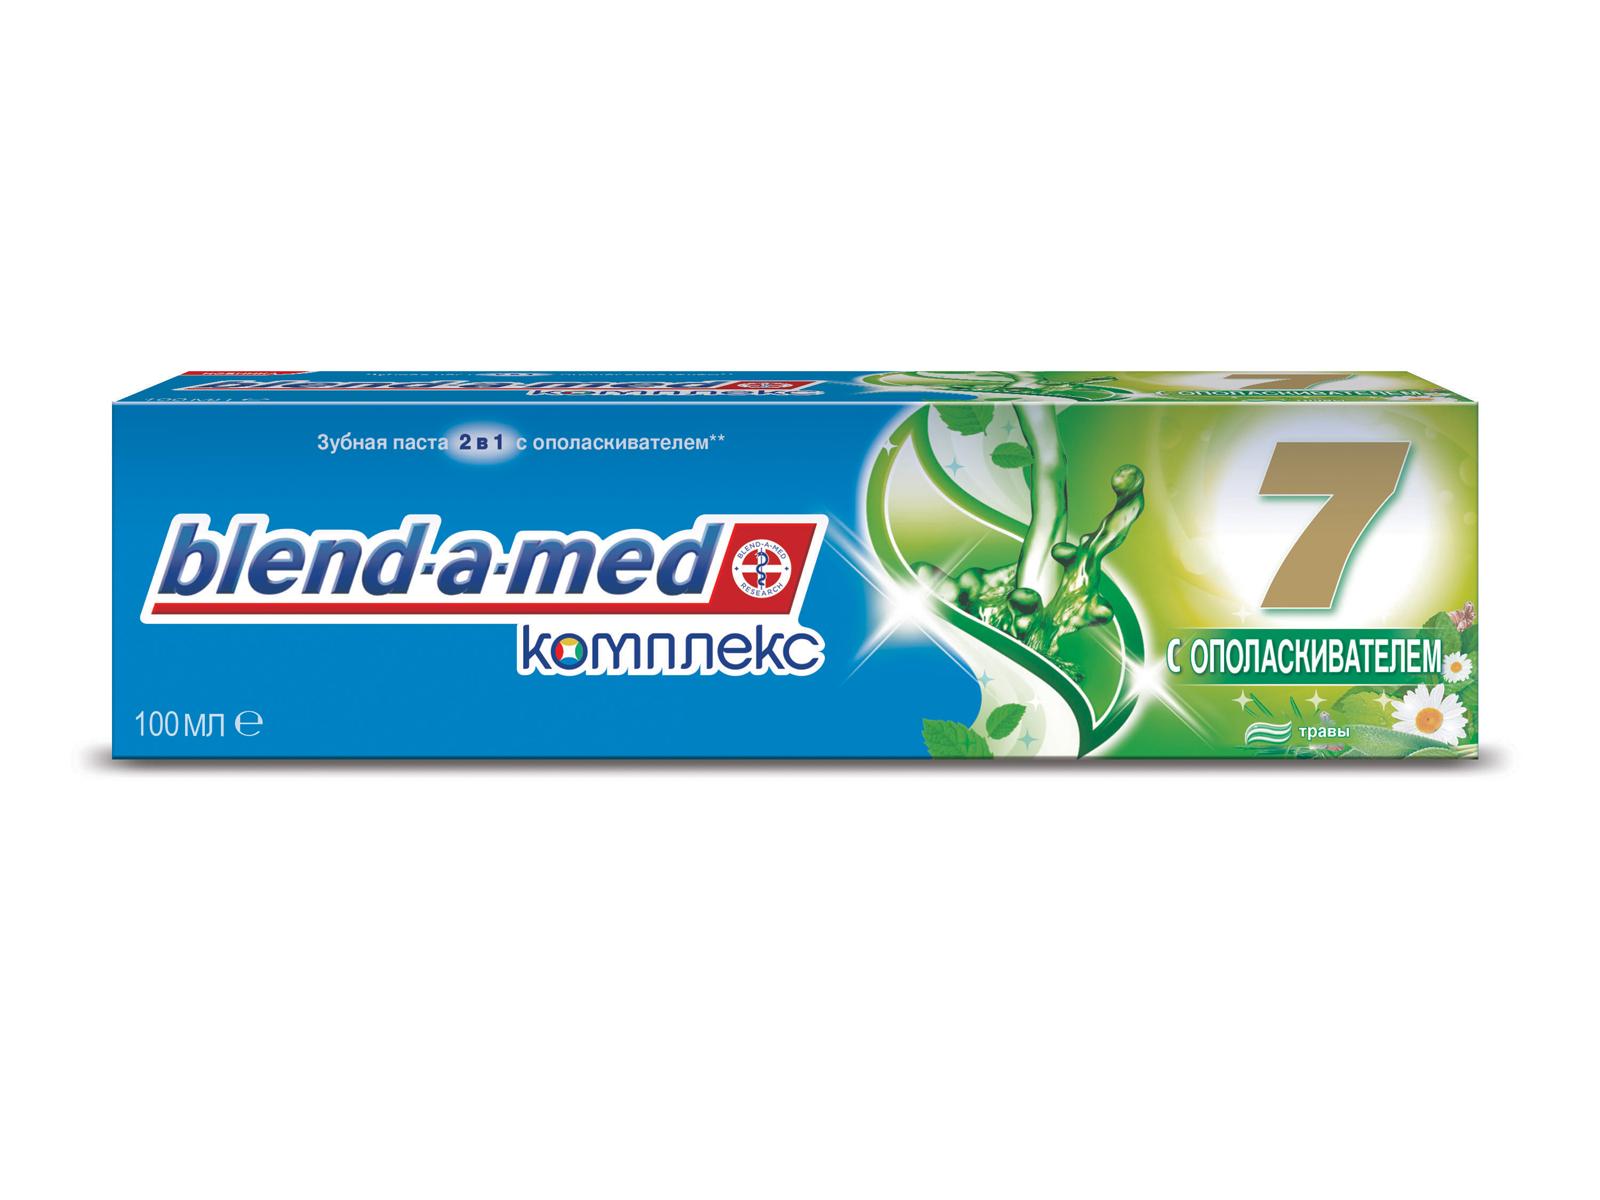 Blend-a-med Зубная паста Комплекс 7 Травы с ополаскивателем, 100 мл